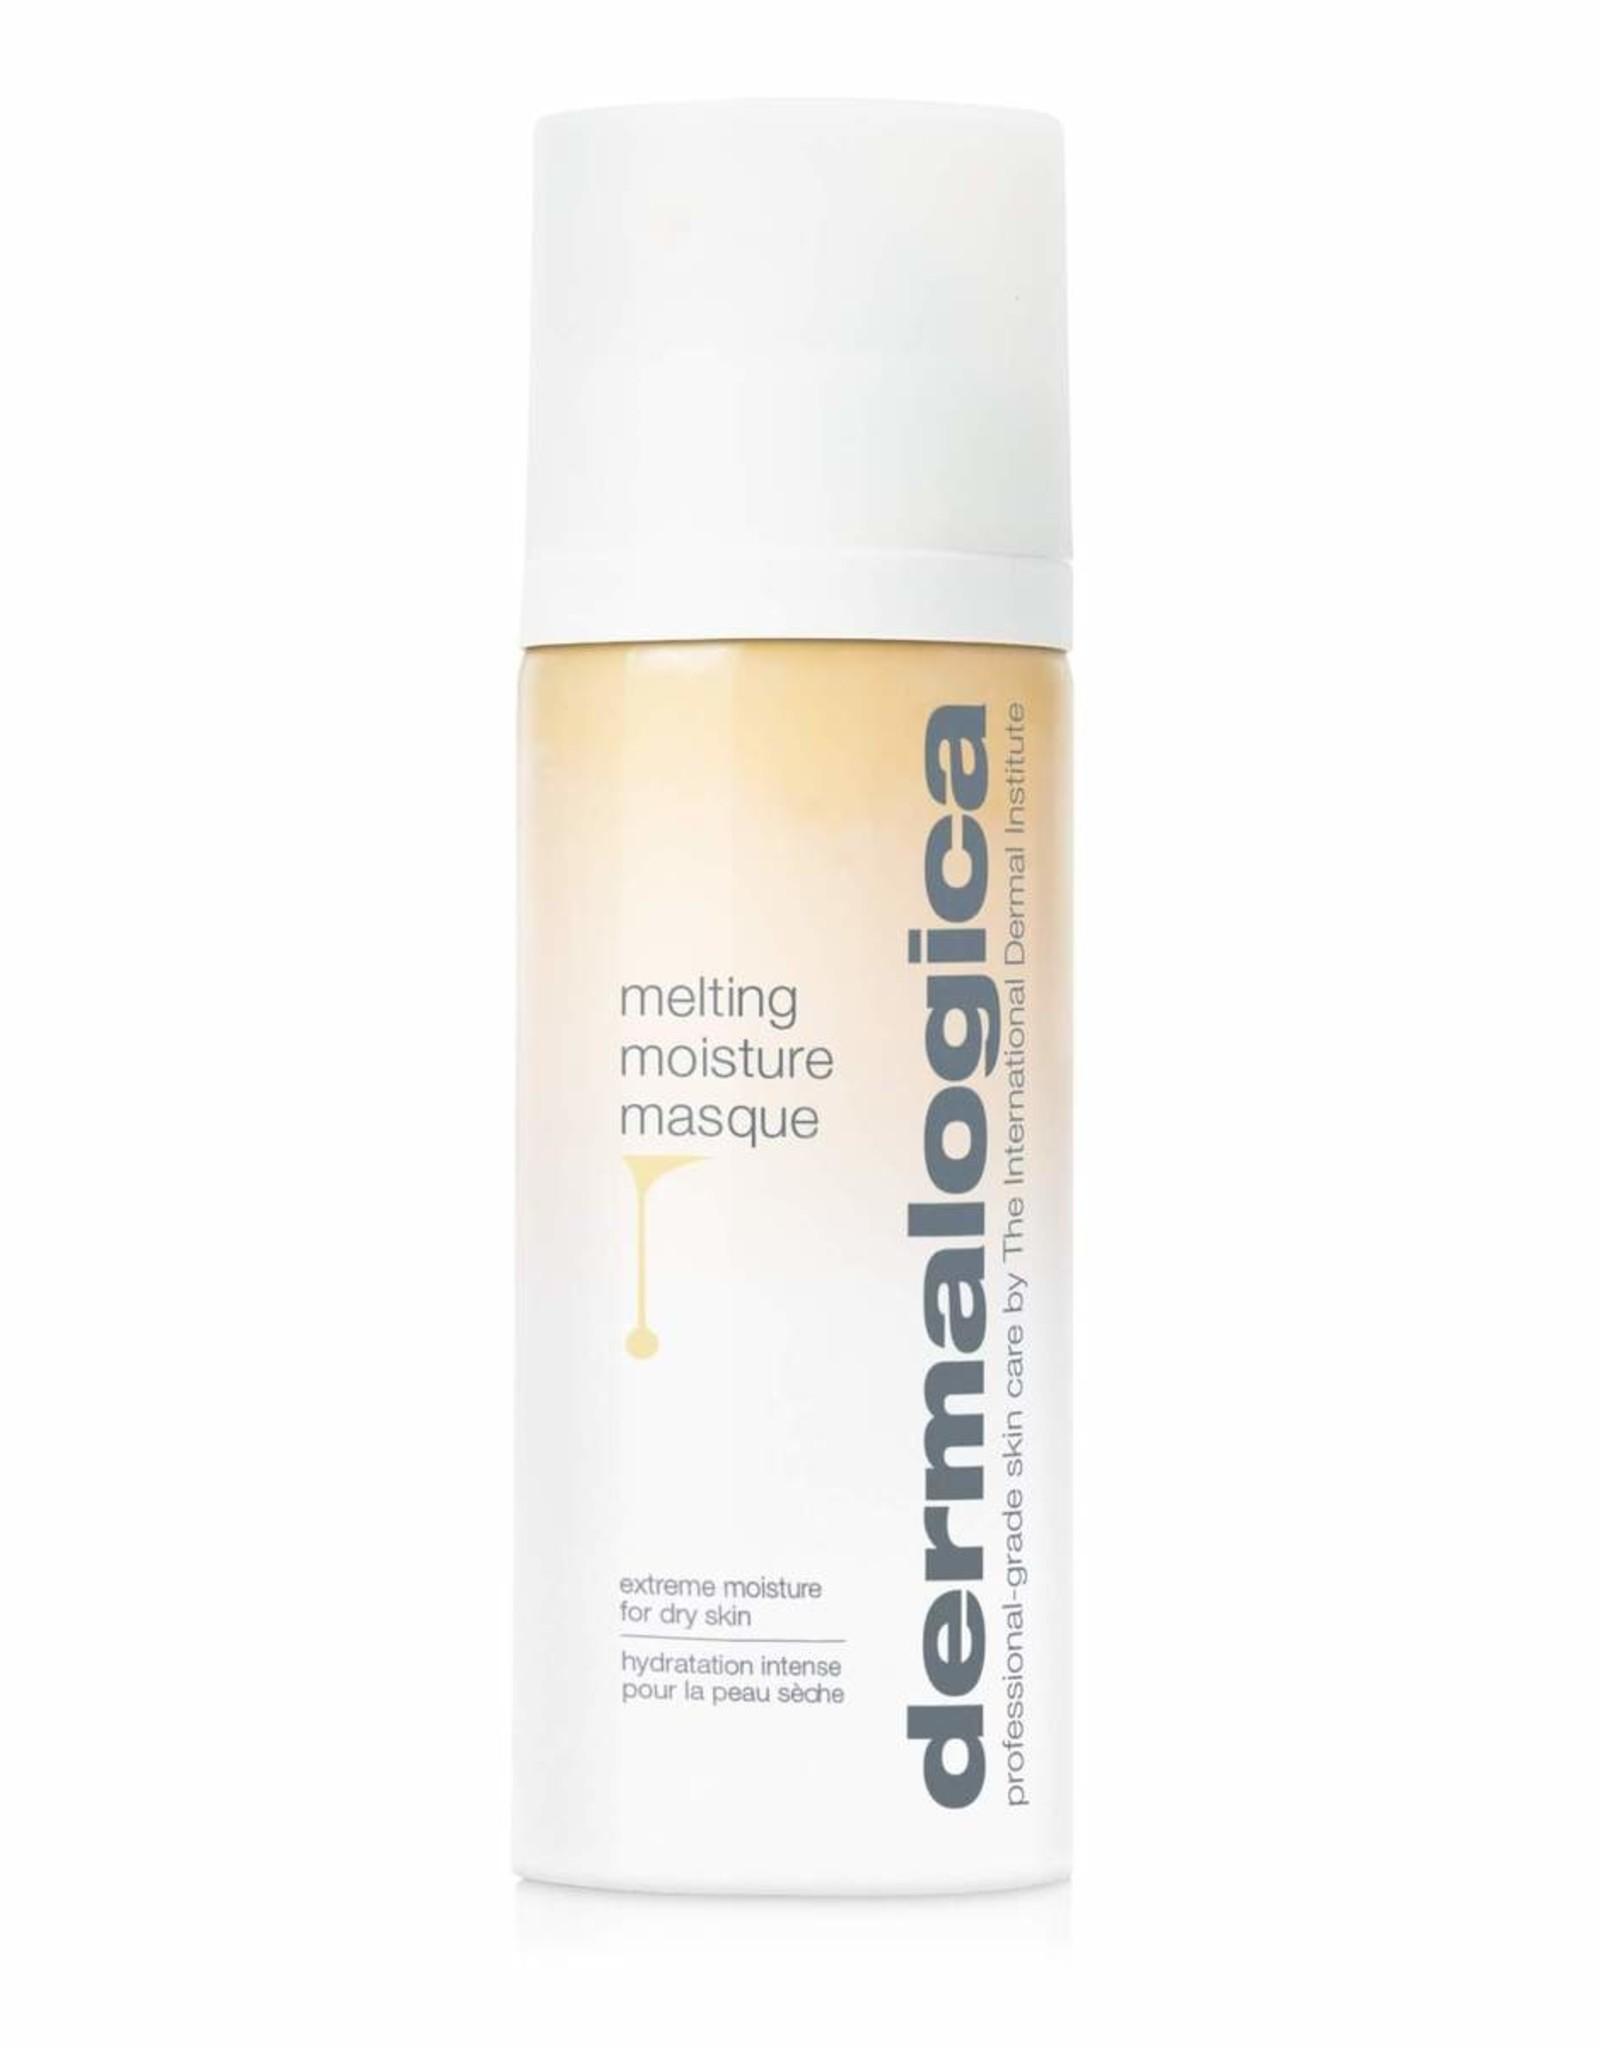 Dermalogica Melting Moisture Masque 50ml - Dermalogica